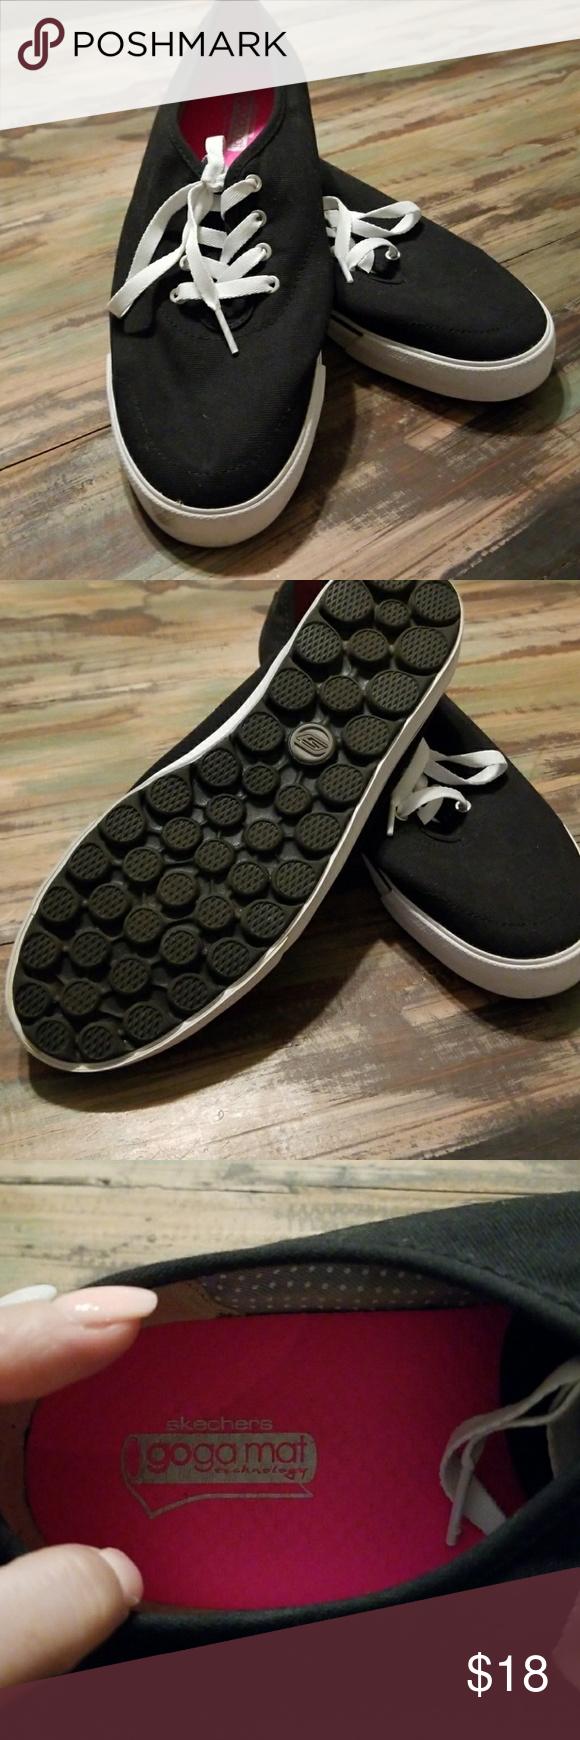 Black slip ons, Skechers shoes, Boat shoes